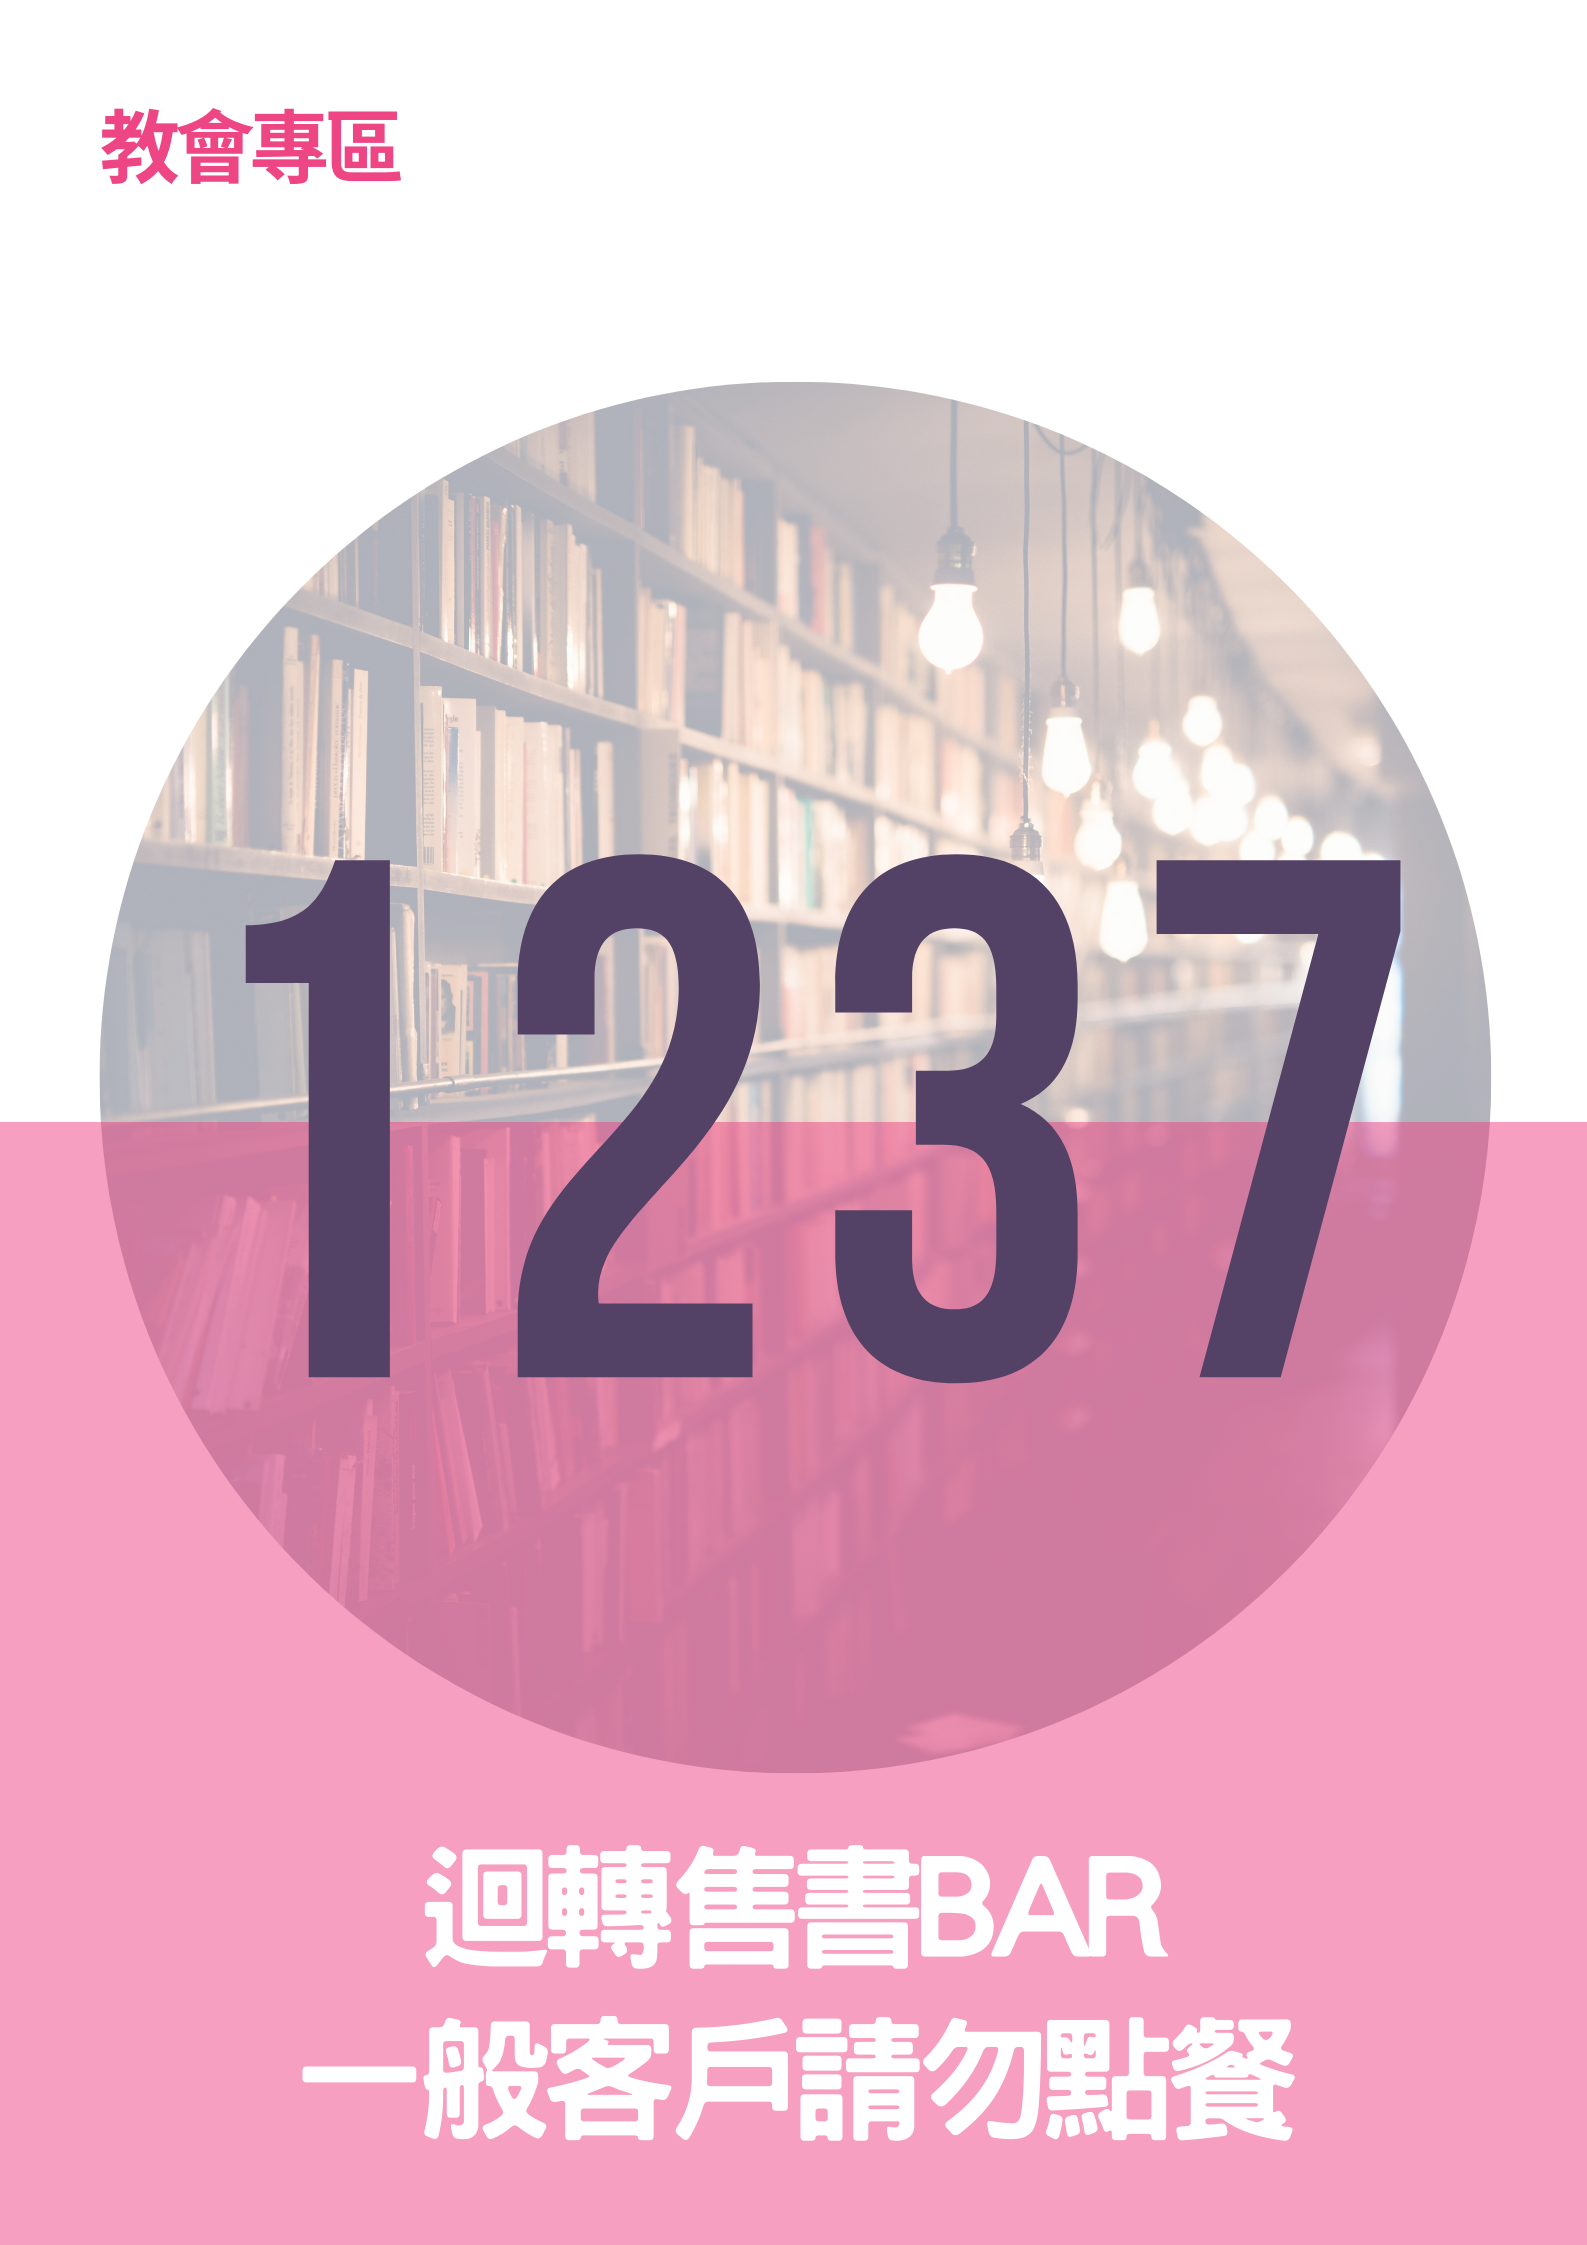 17296245